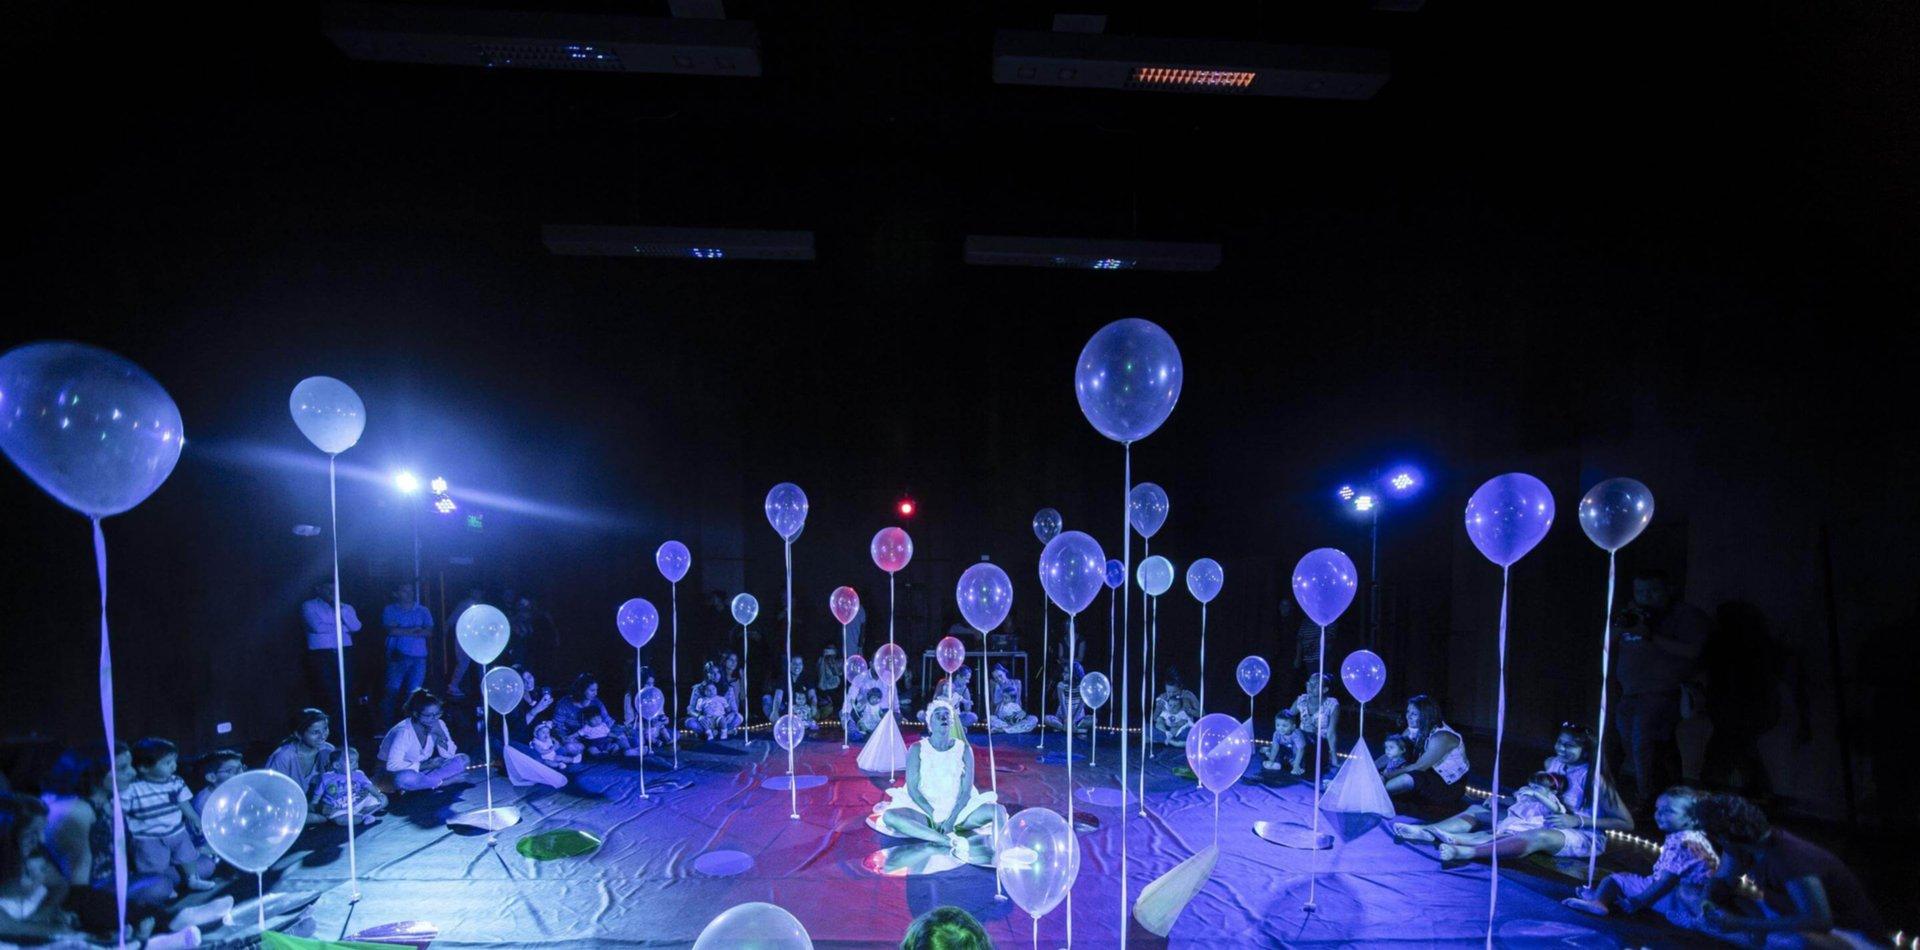 Flotante vuelve a La Plata: dedicada a los bebés, una sensacional experiencia sensorial